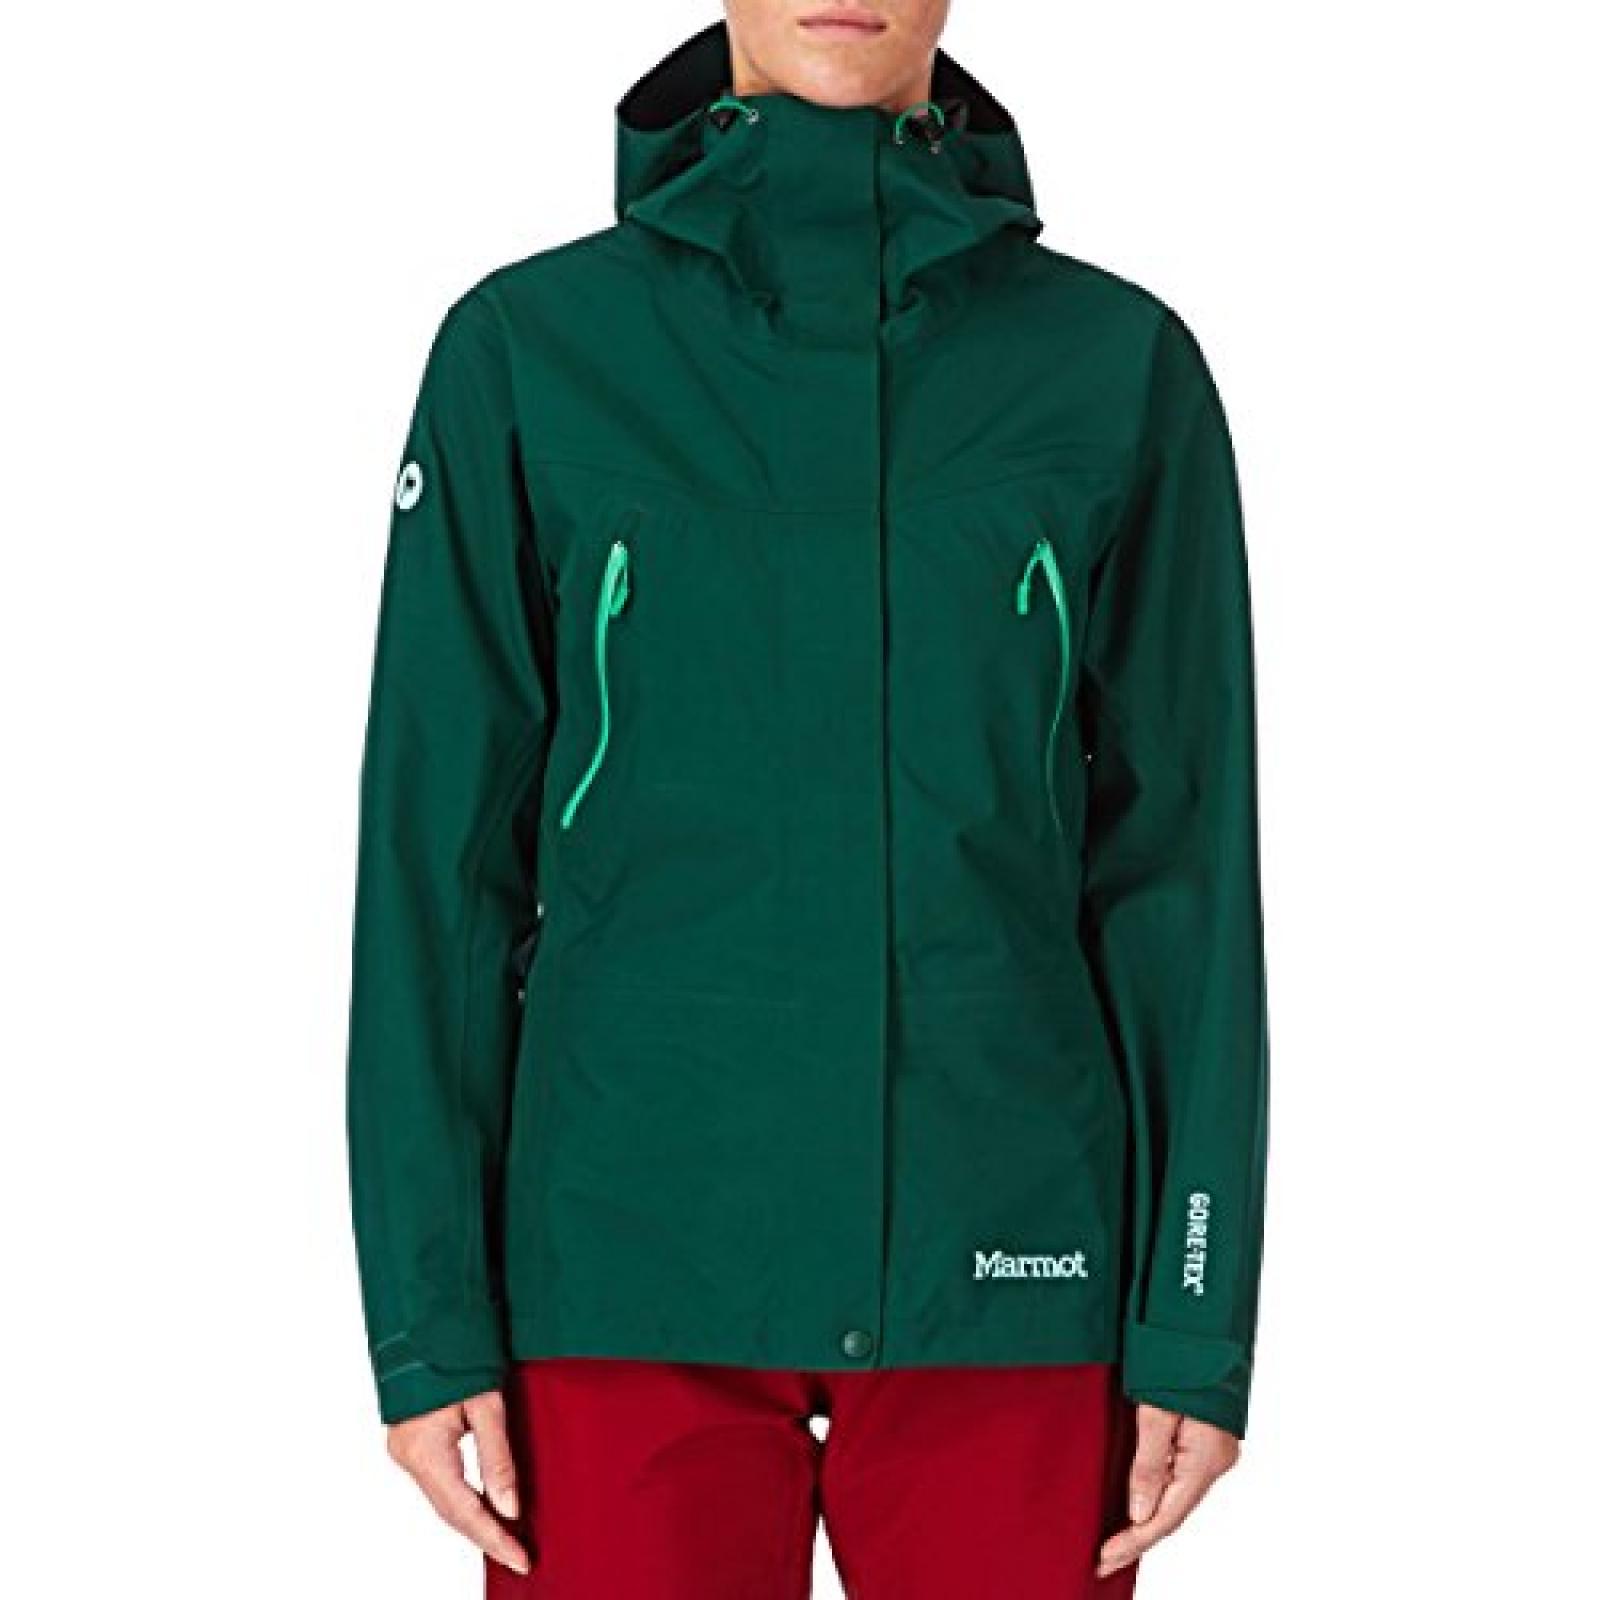 Marmot Spire Jacket - Gator